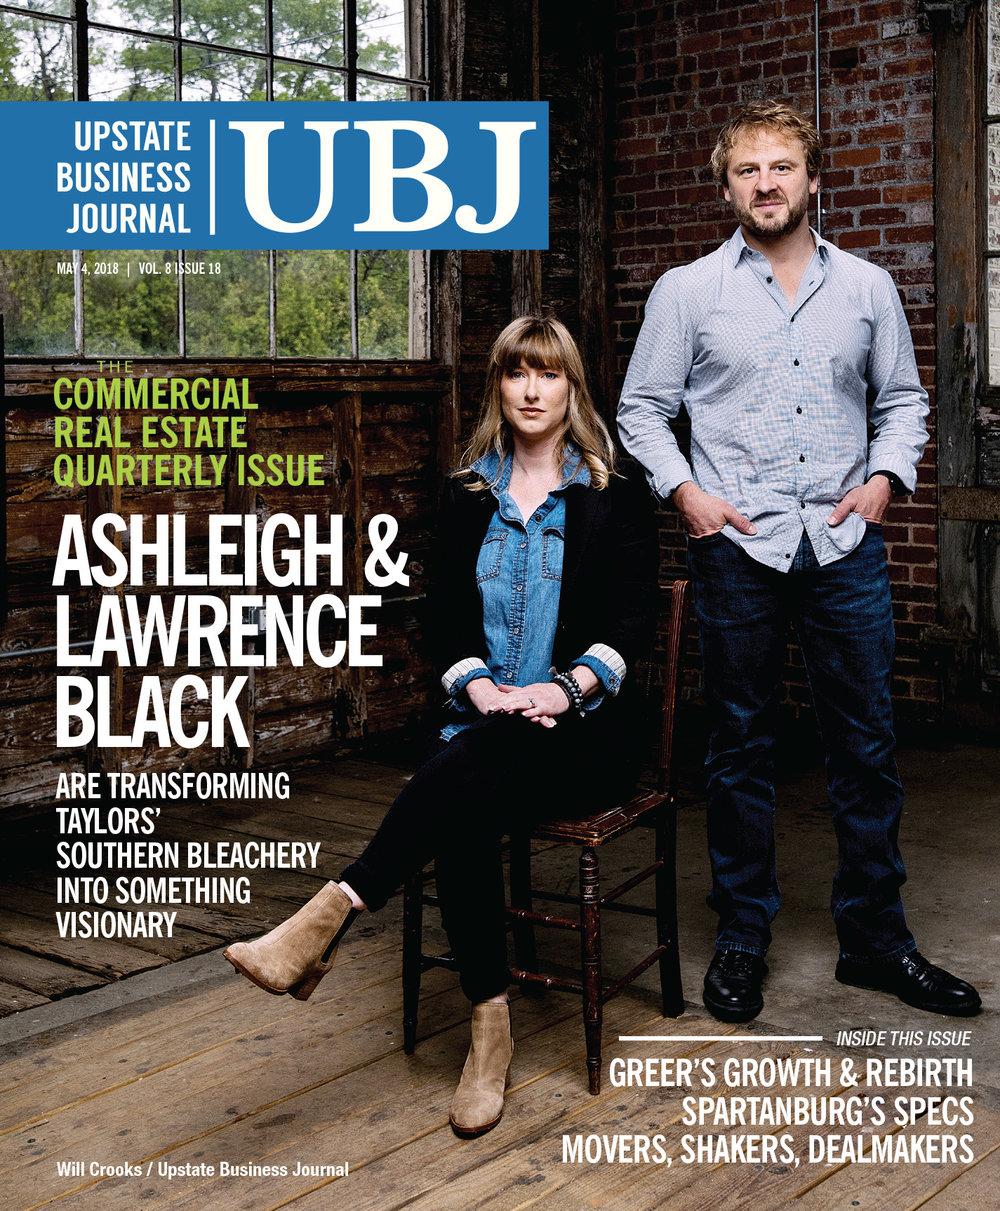 UBJ-MAY18 Cover.jpg